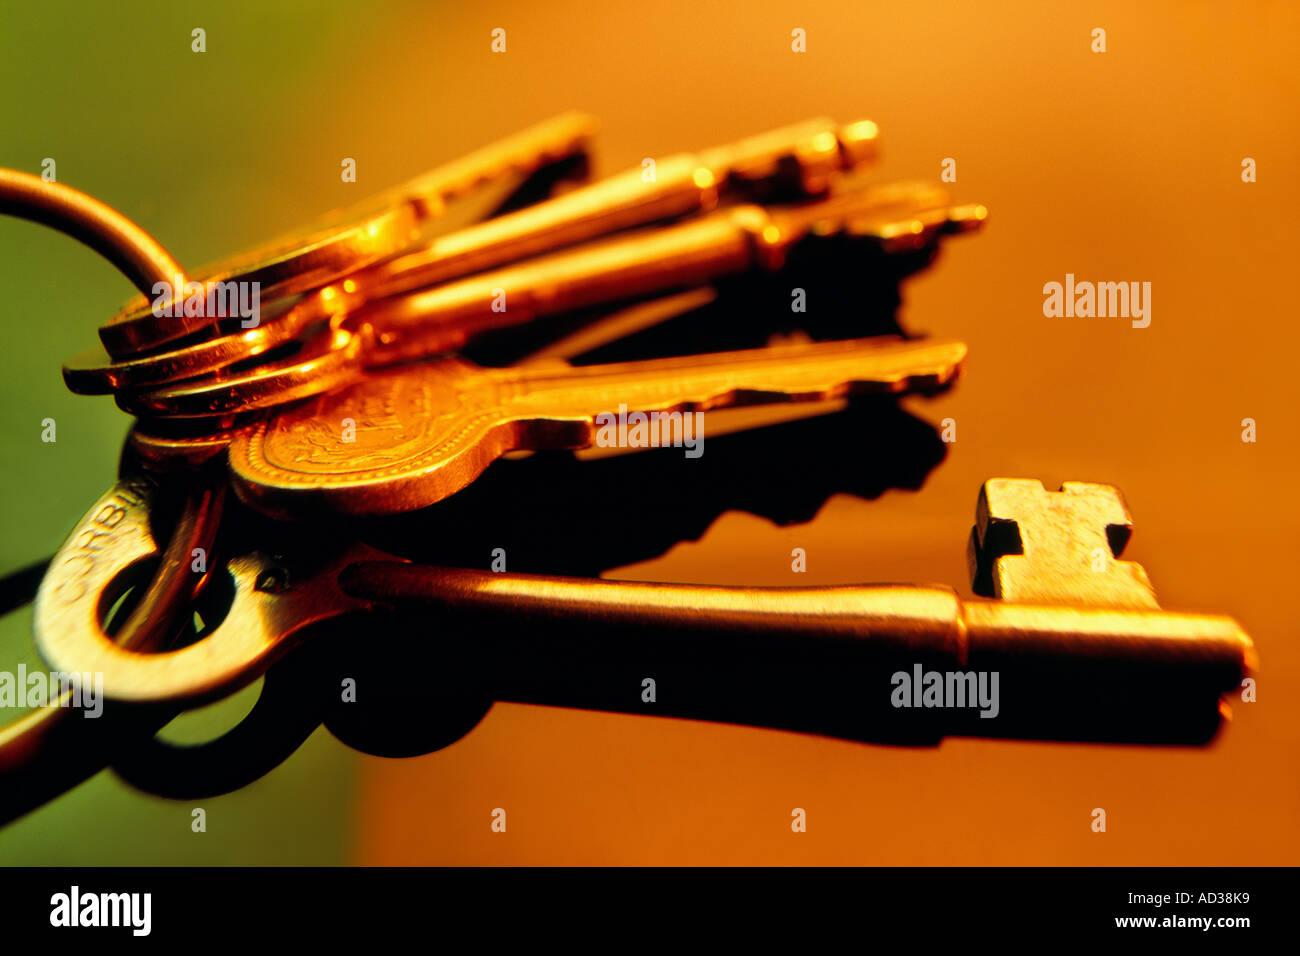 Studio illustration of a ring of keys representing accountability - Stock Image